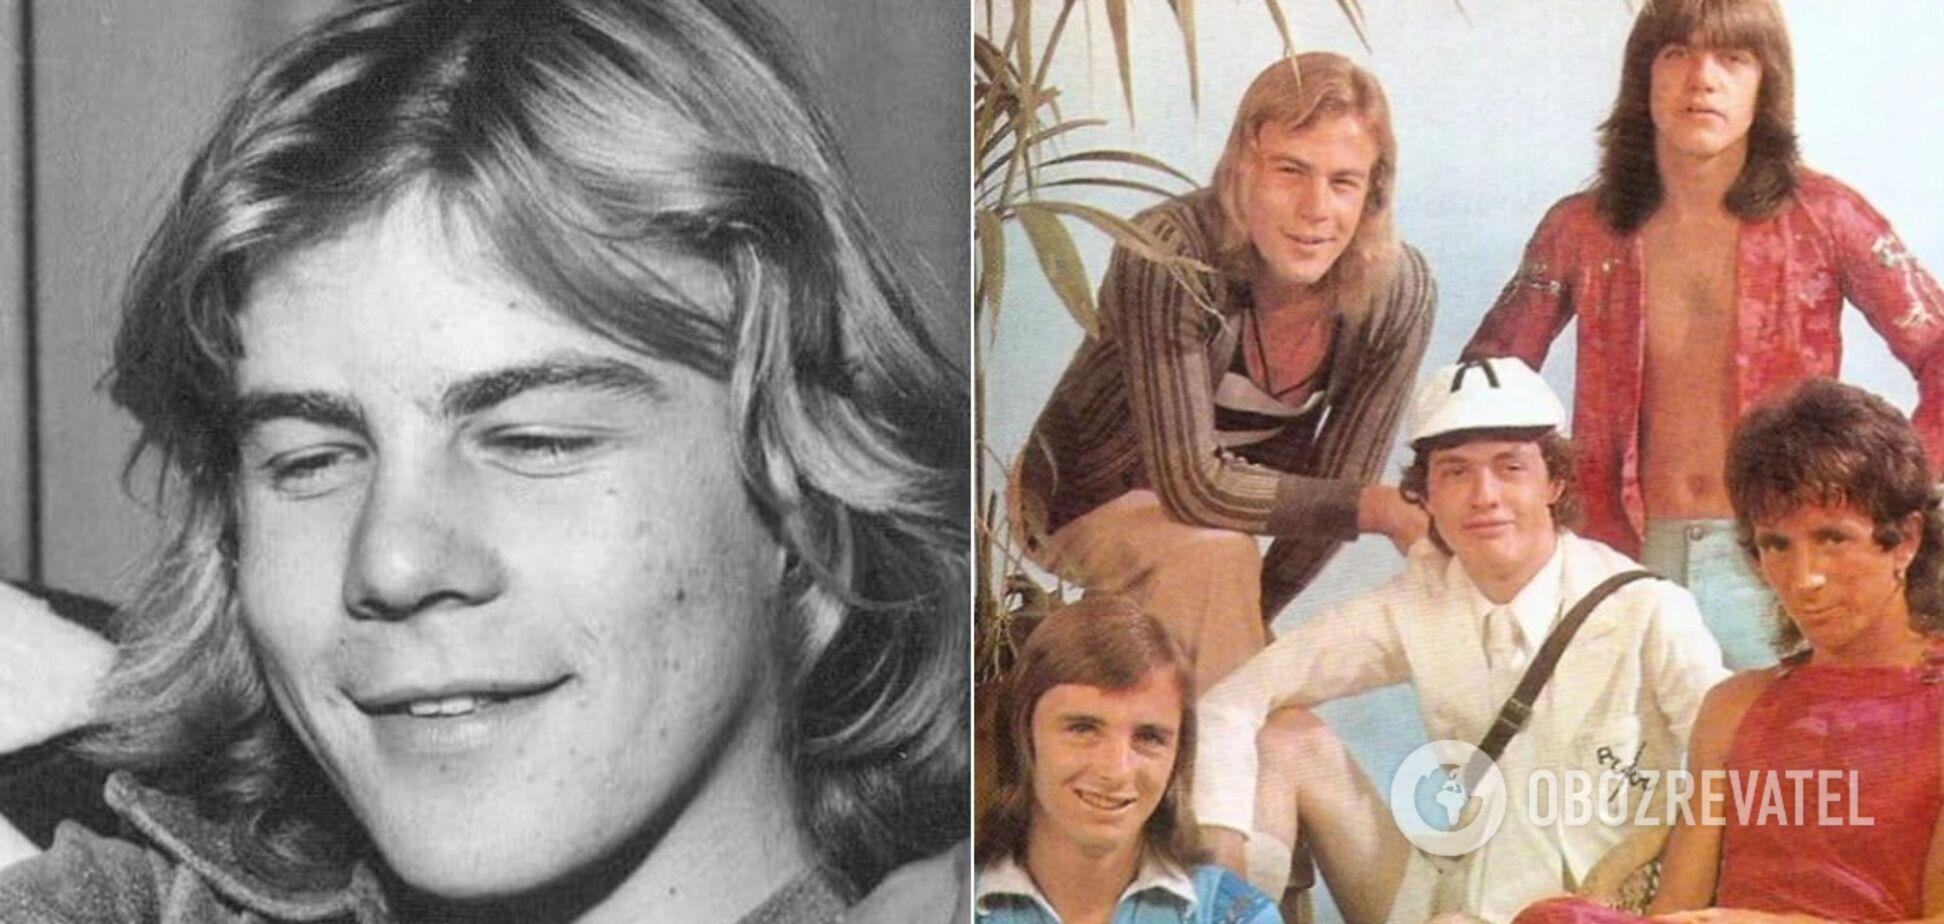 Умер экс-участник культовой группы AC/DC Пол Мэттерс